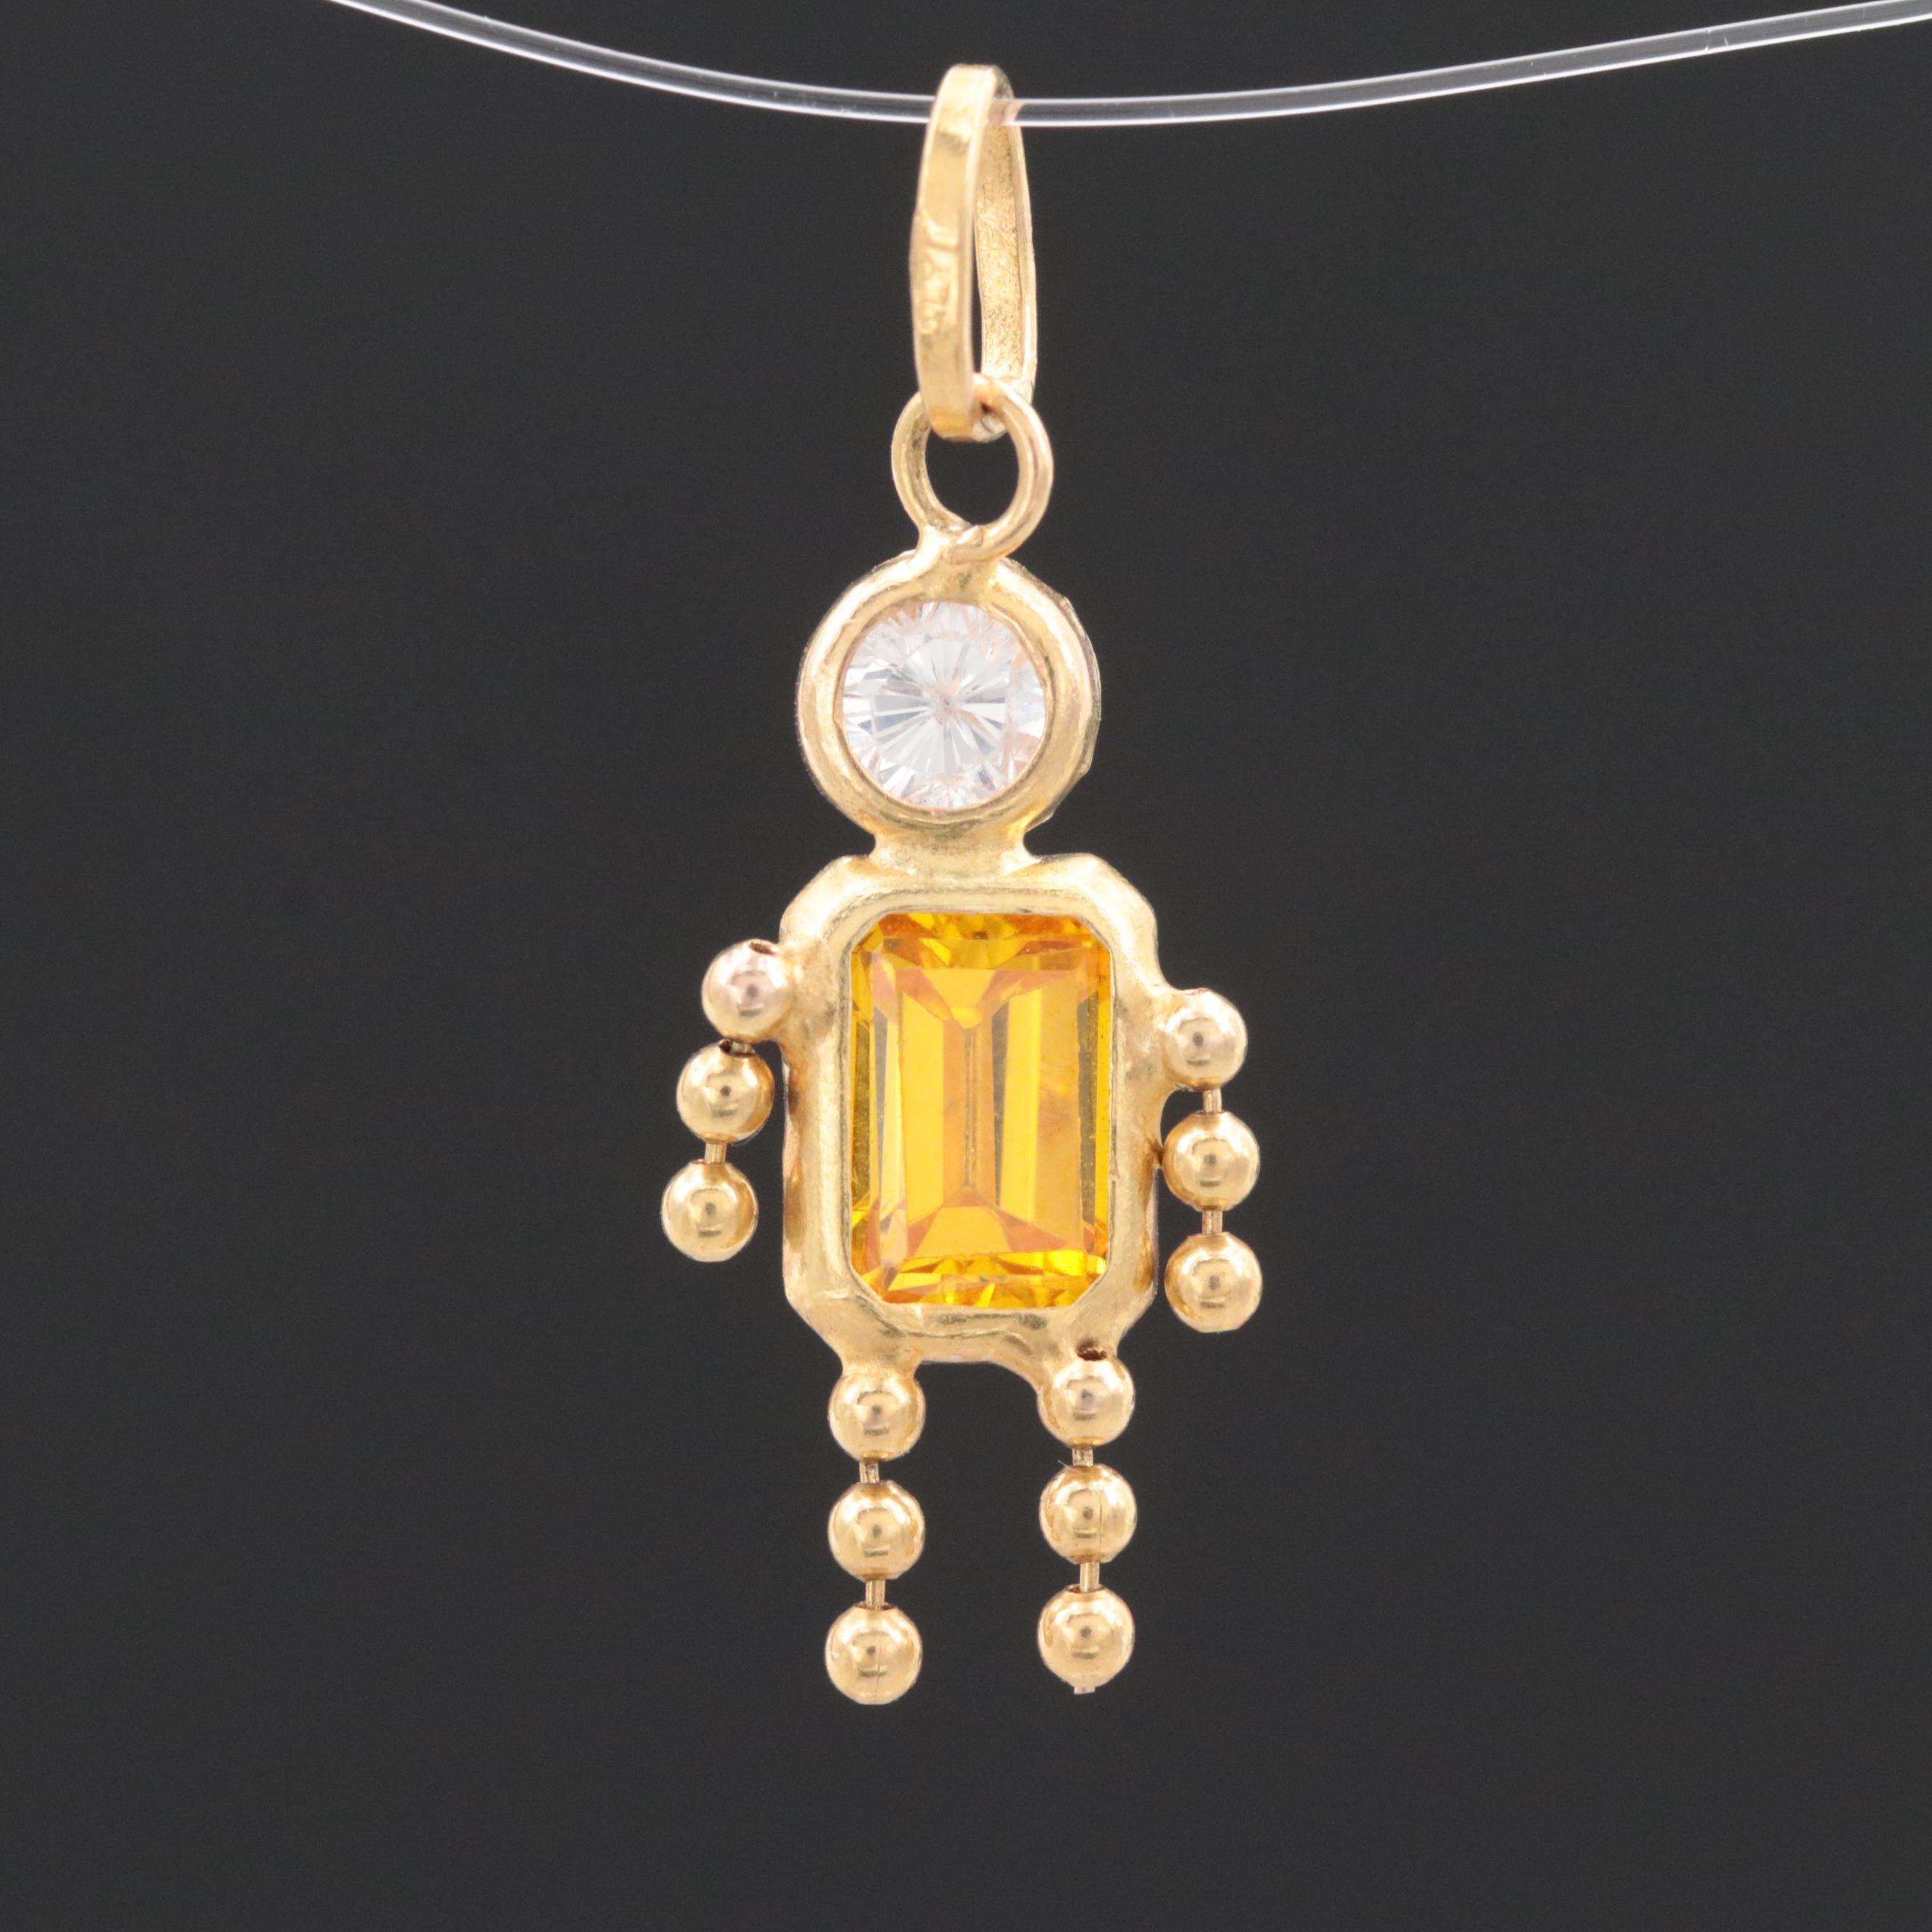 14K Yellow Gold Cubic Zirconia Birthstone Style Pendant